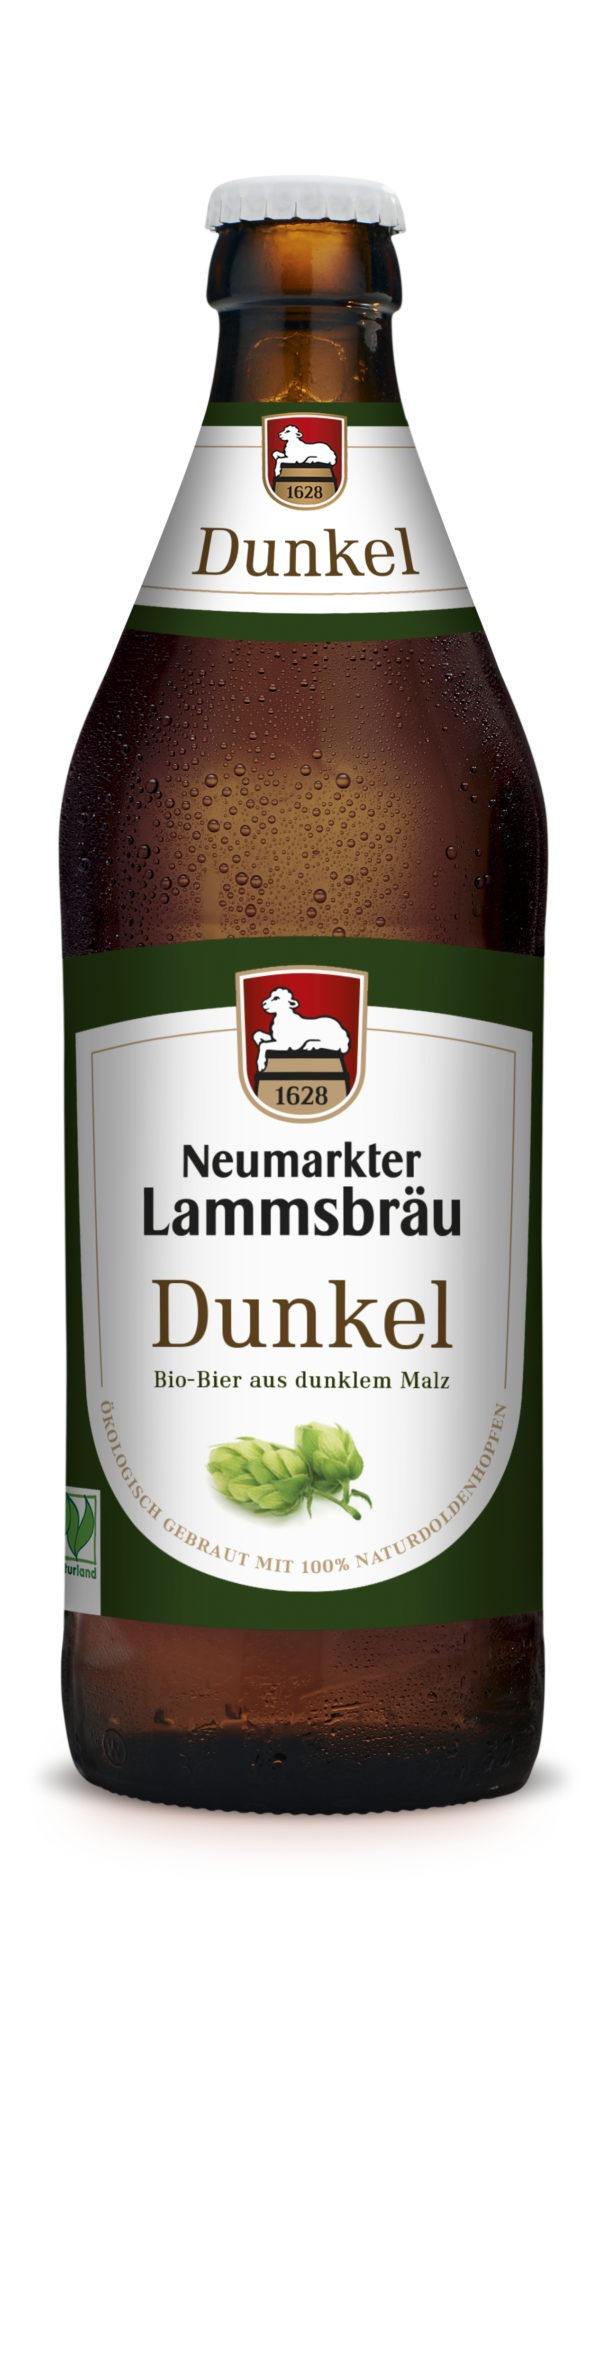 Neumarkter Lammsbräu Lammsbräu Dunkel (Bio) 10x0,5l